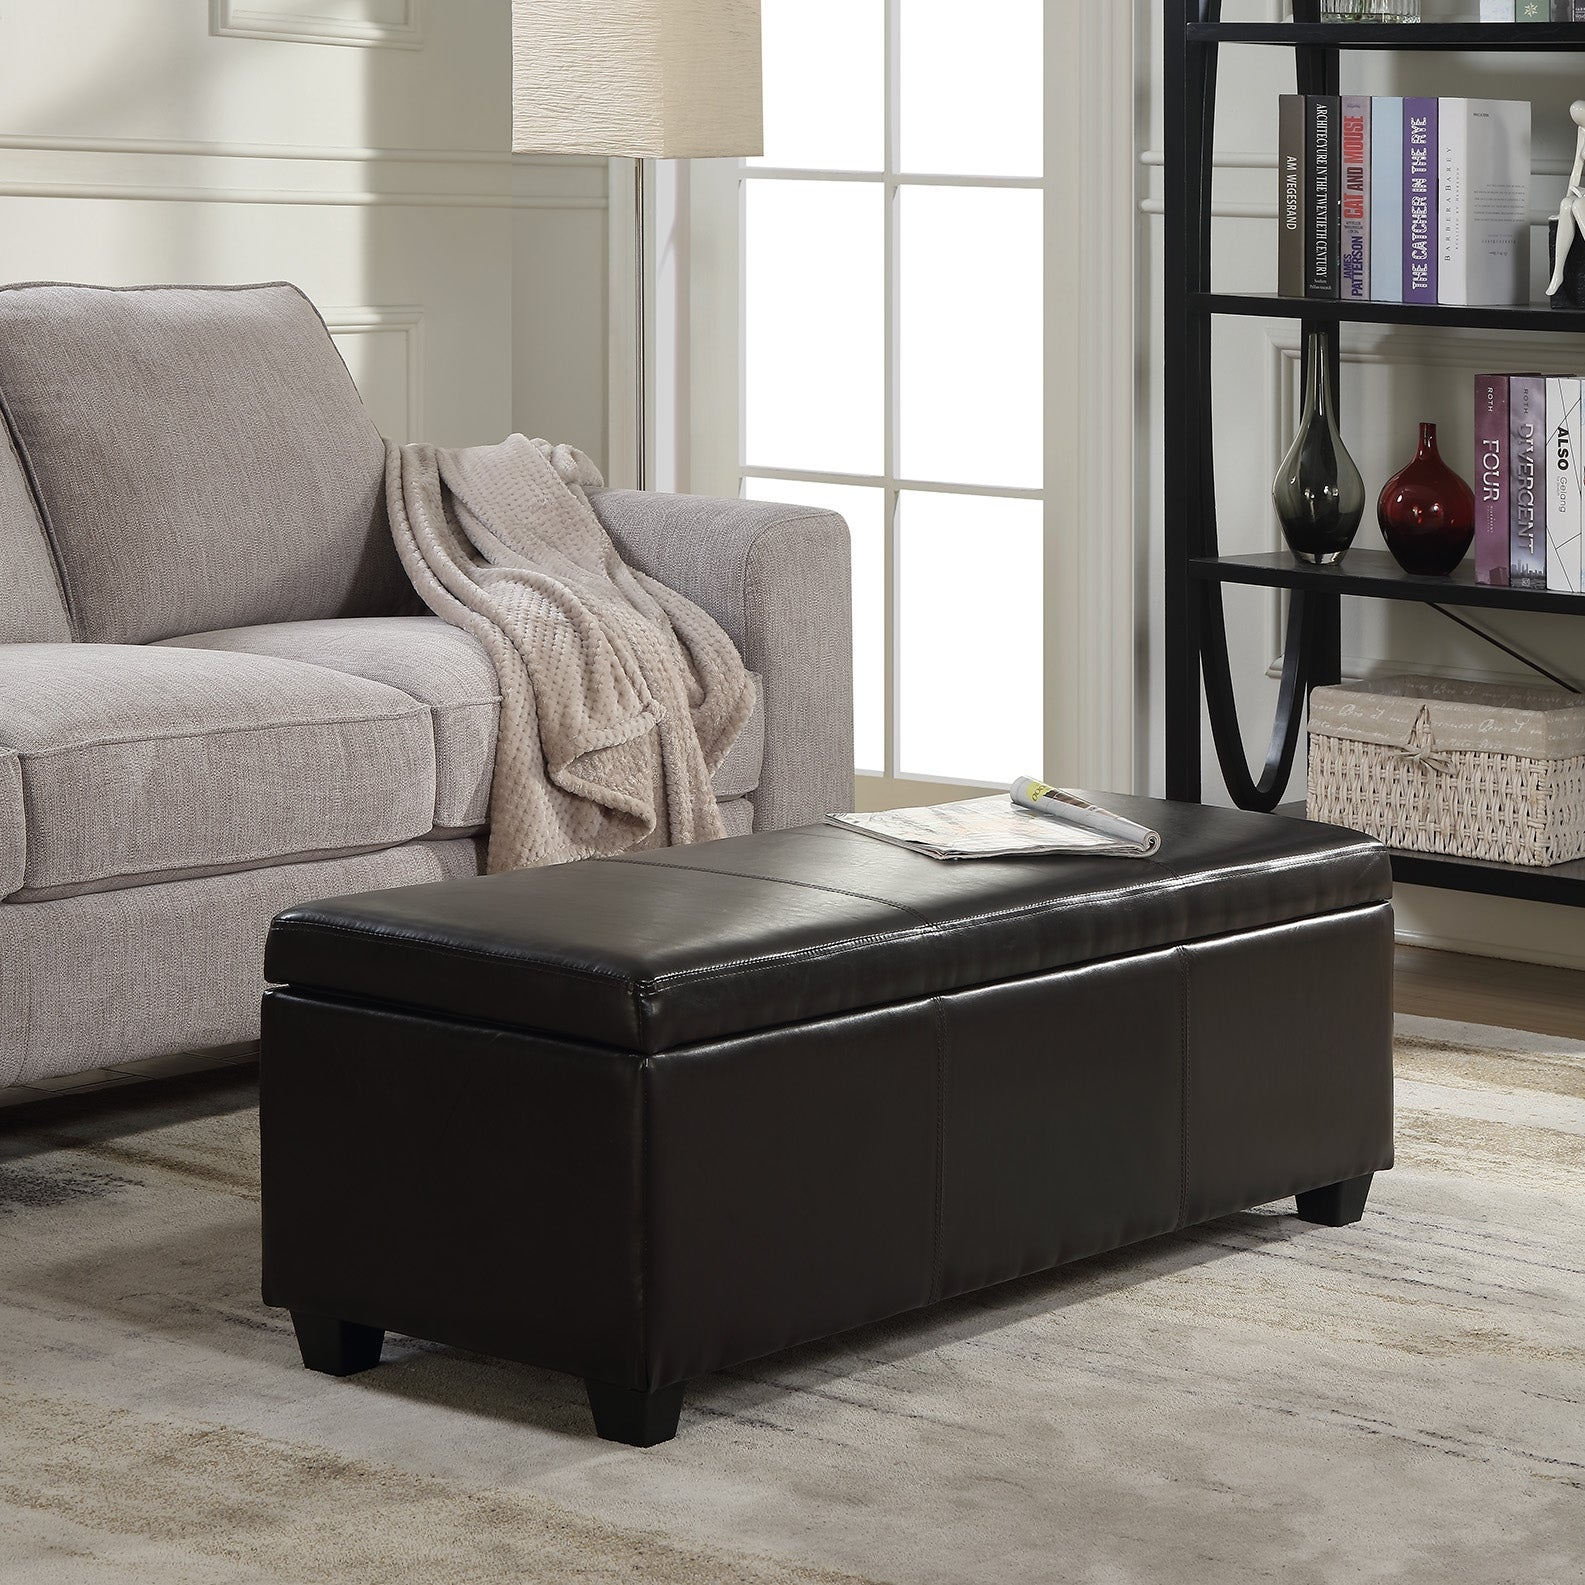 Belleze Modern Elegant Ottoman Storage Bench Faux Leather Linen 48 Standard Overstock 22163149